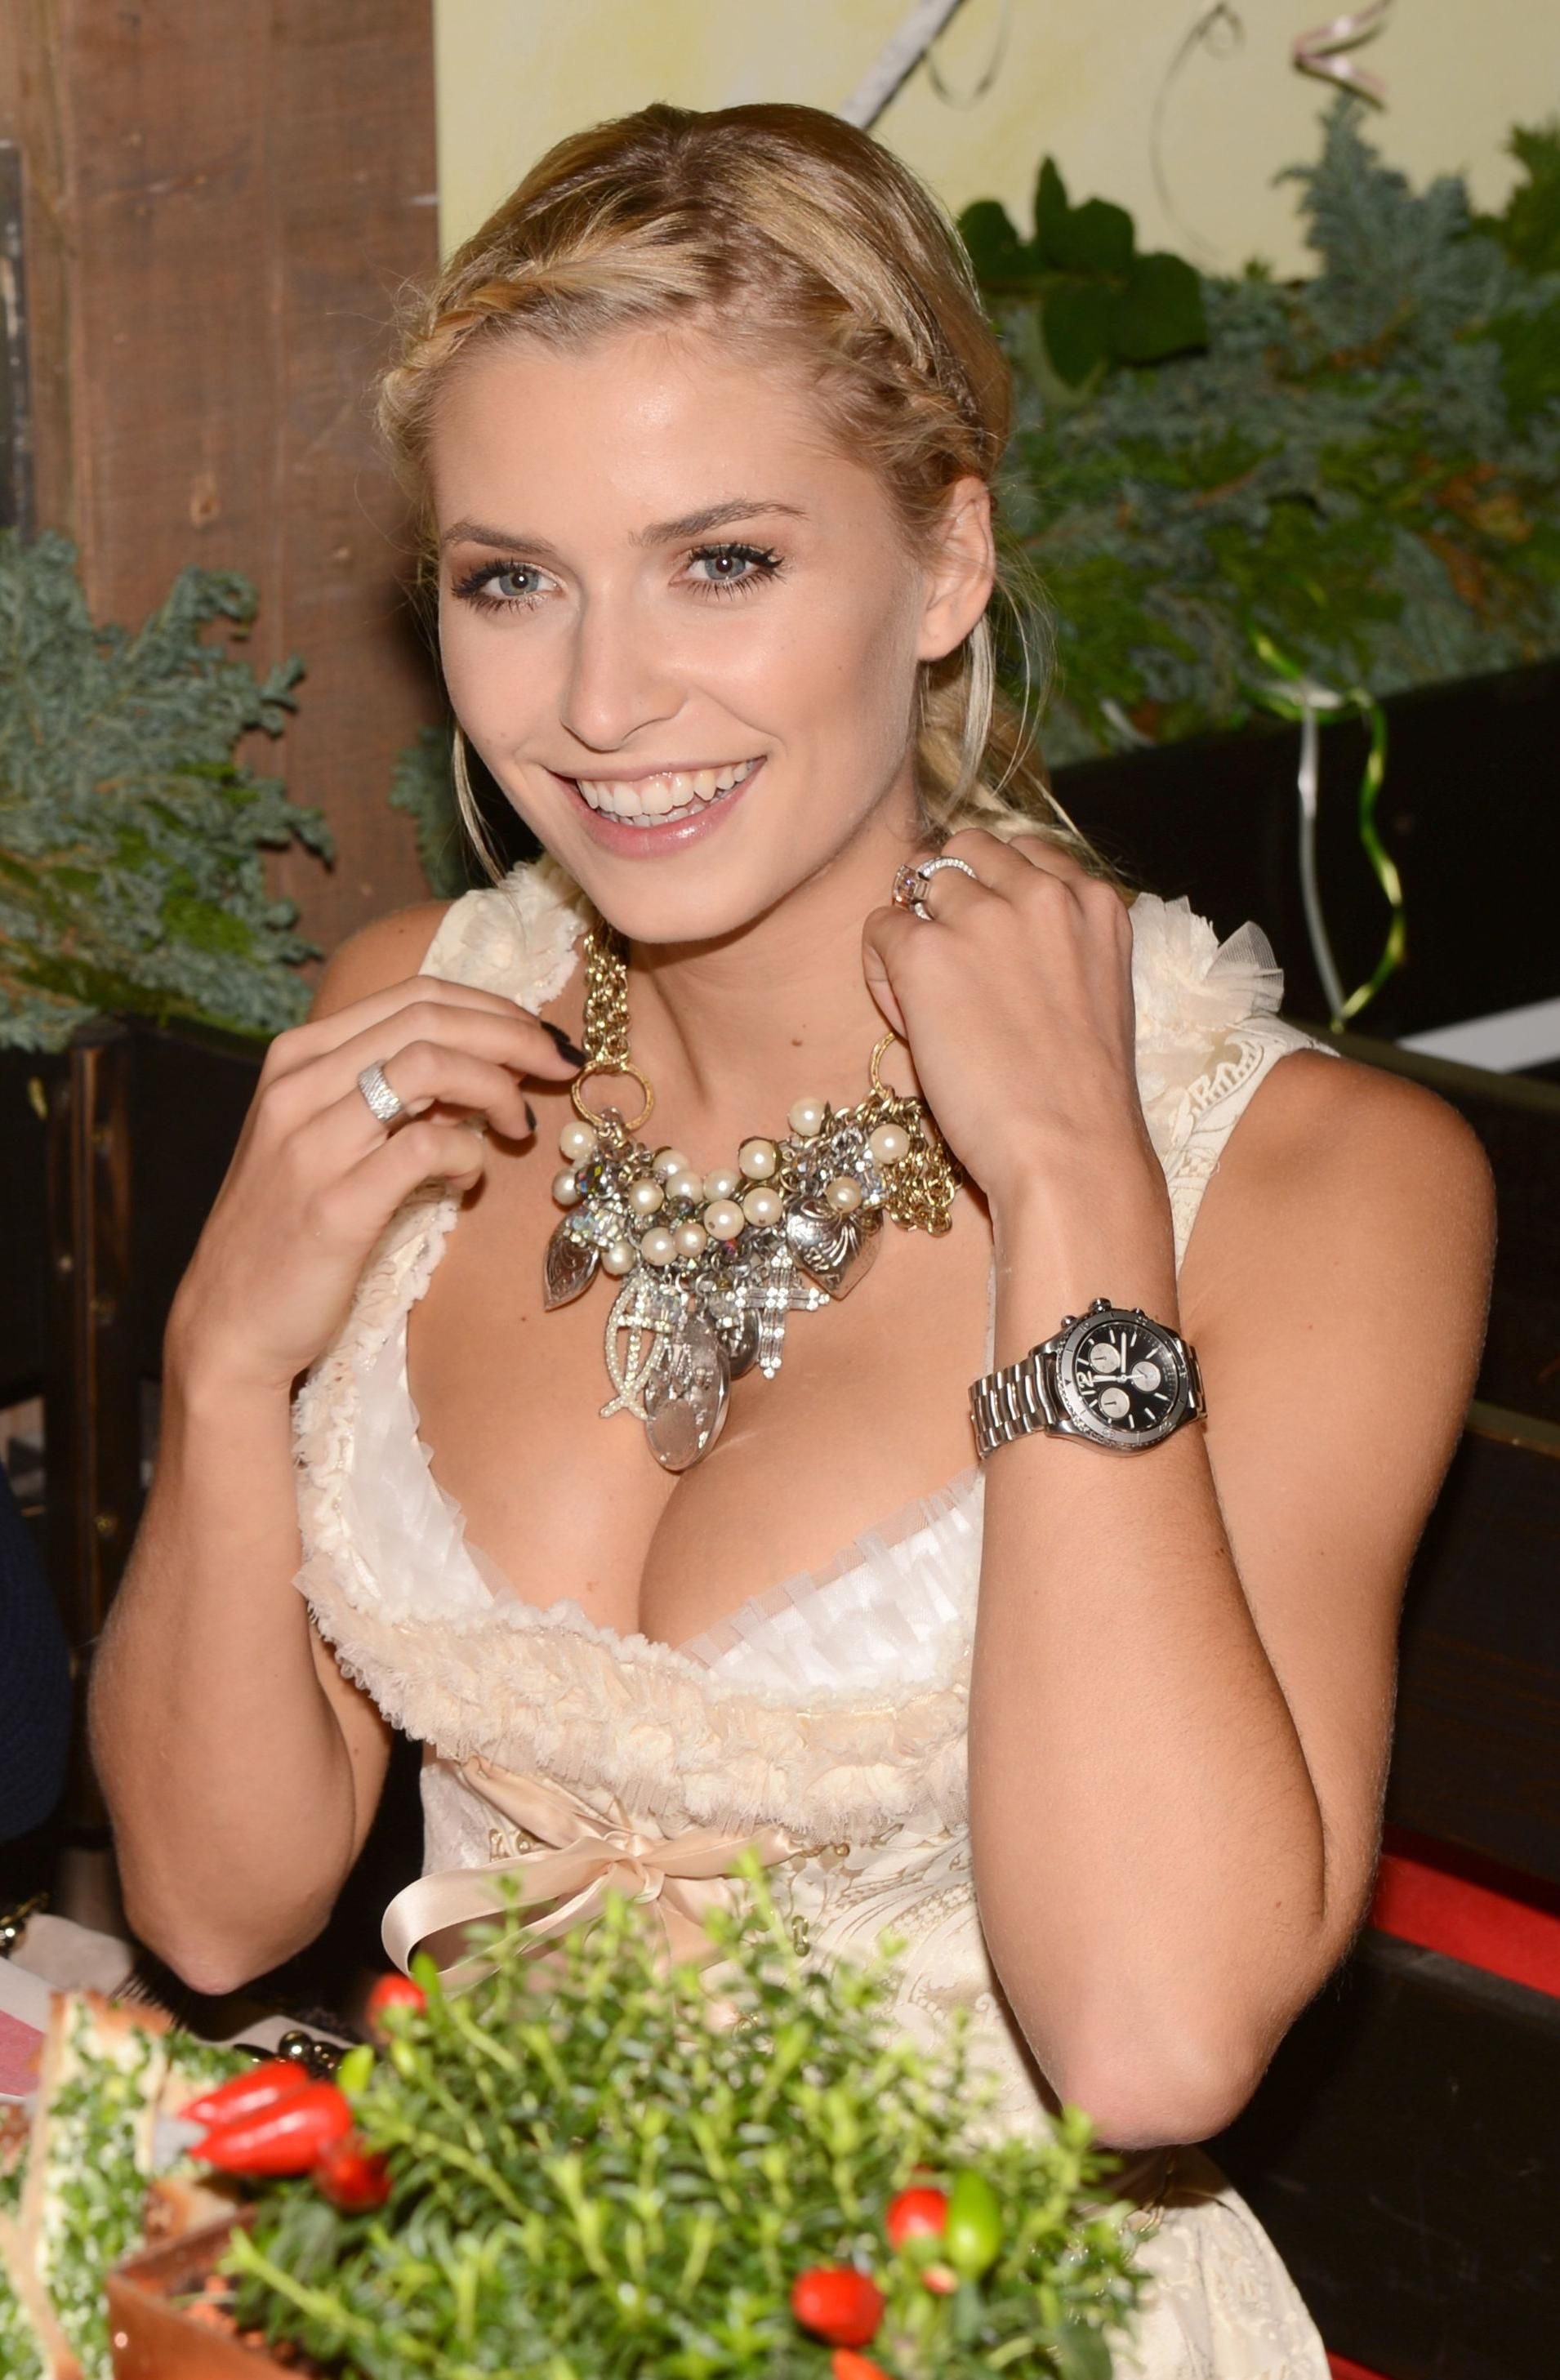 lena gercke | Lena G | Pinterest | Sexy wife, Smiling